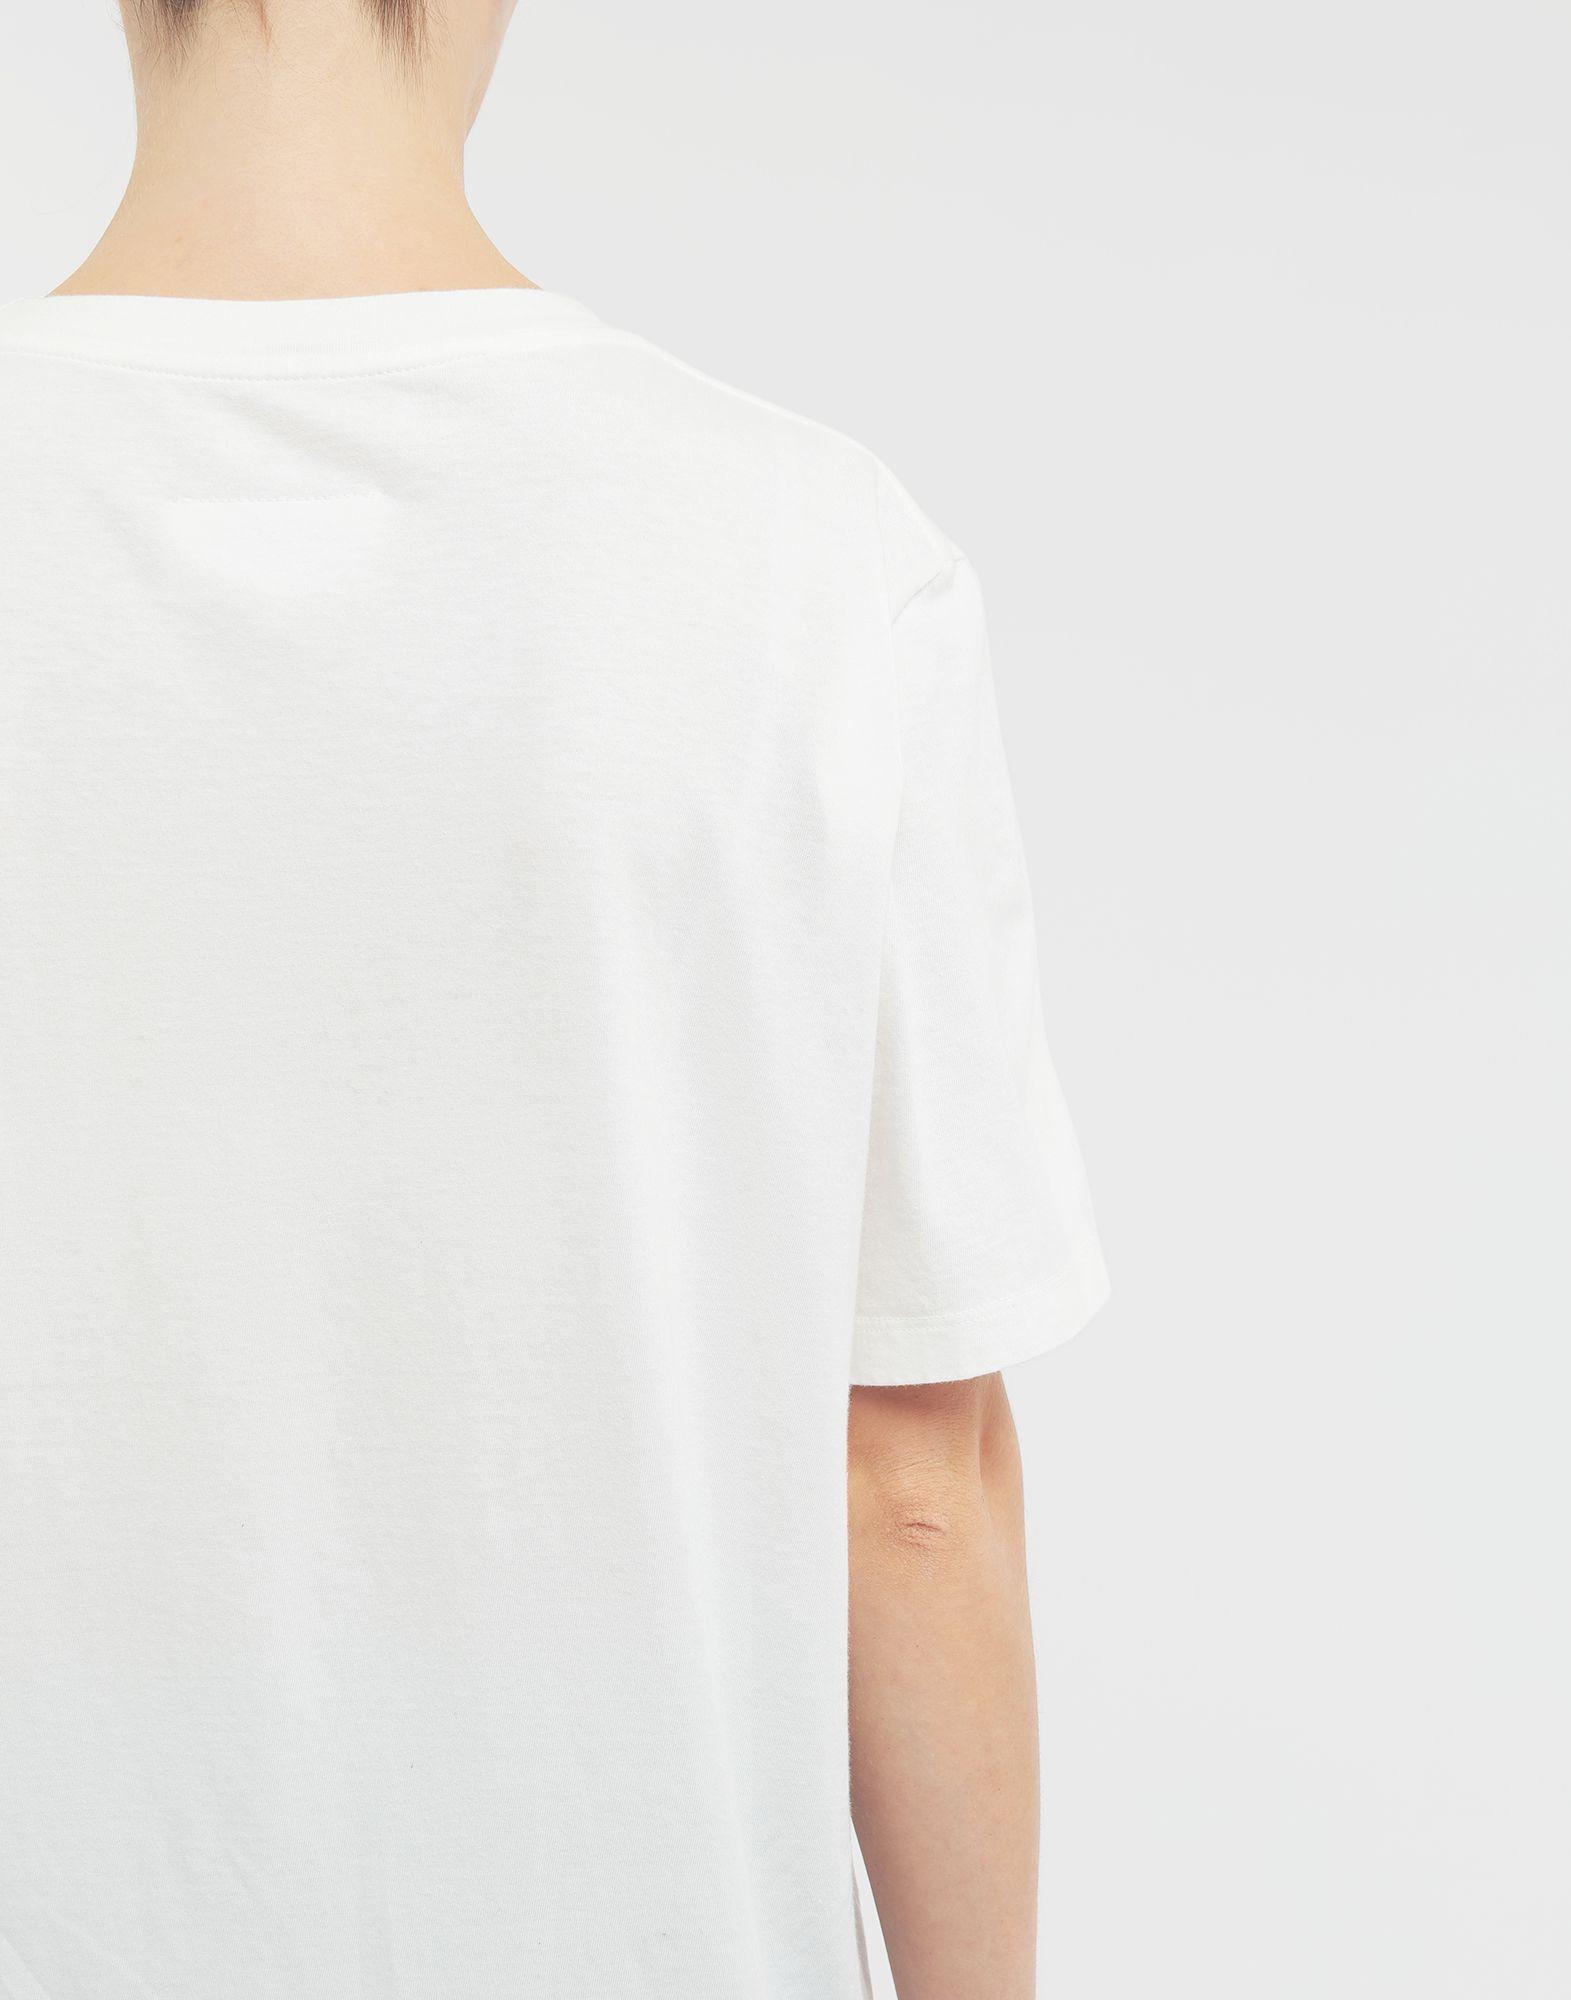 MM6 MAISON MARGIELA Kidswear print T-shirt Short sleeve t-shirt Woman b